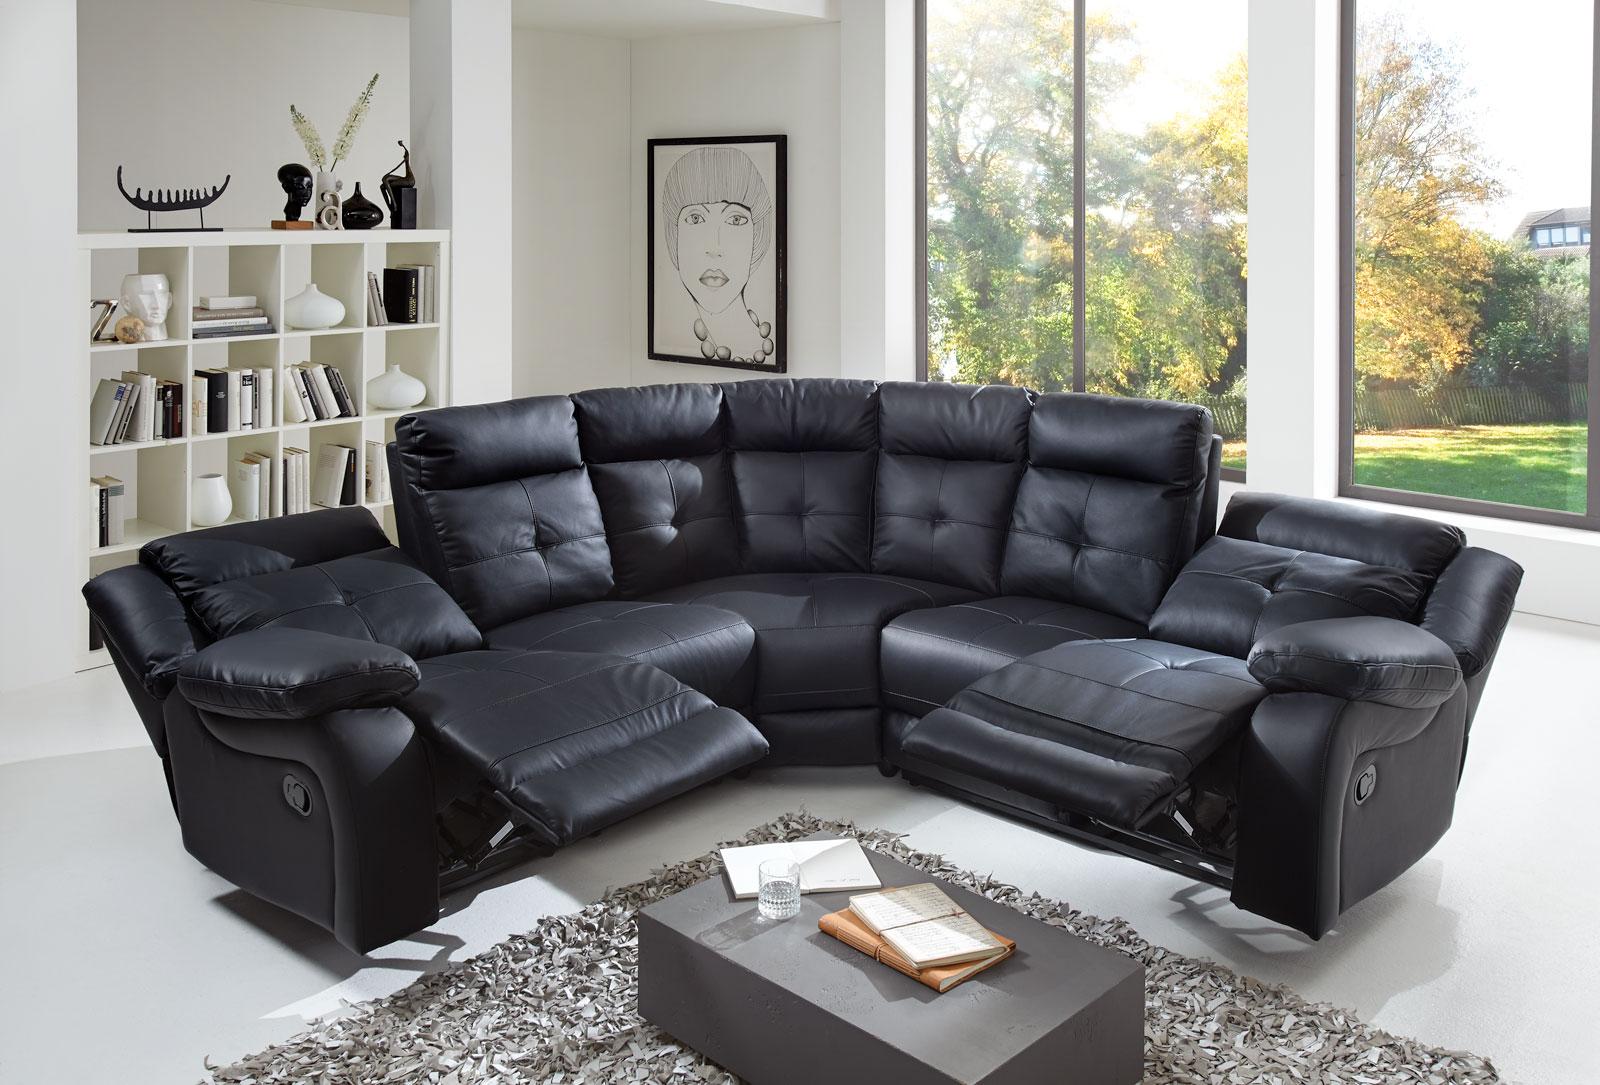 Ecksofa Relaxfunktion 5193 Made House Decor